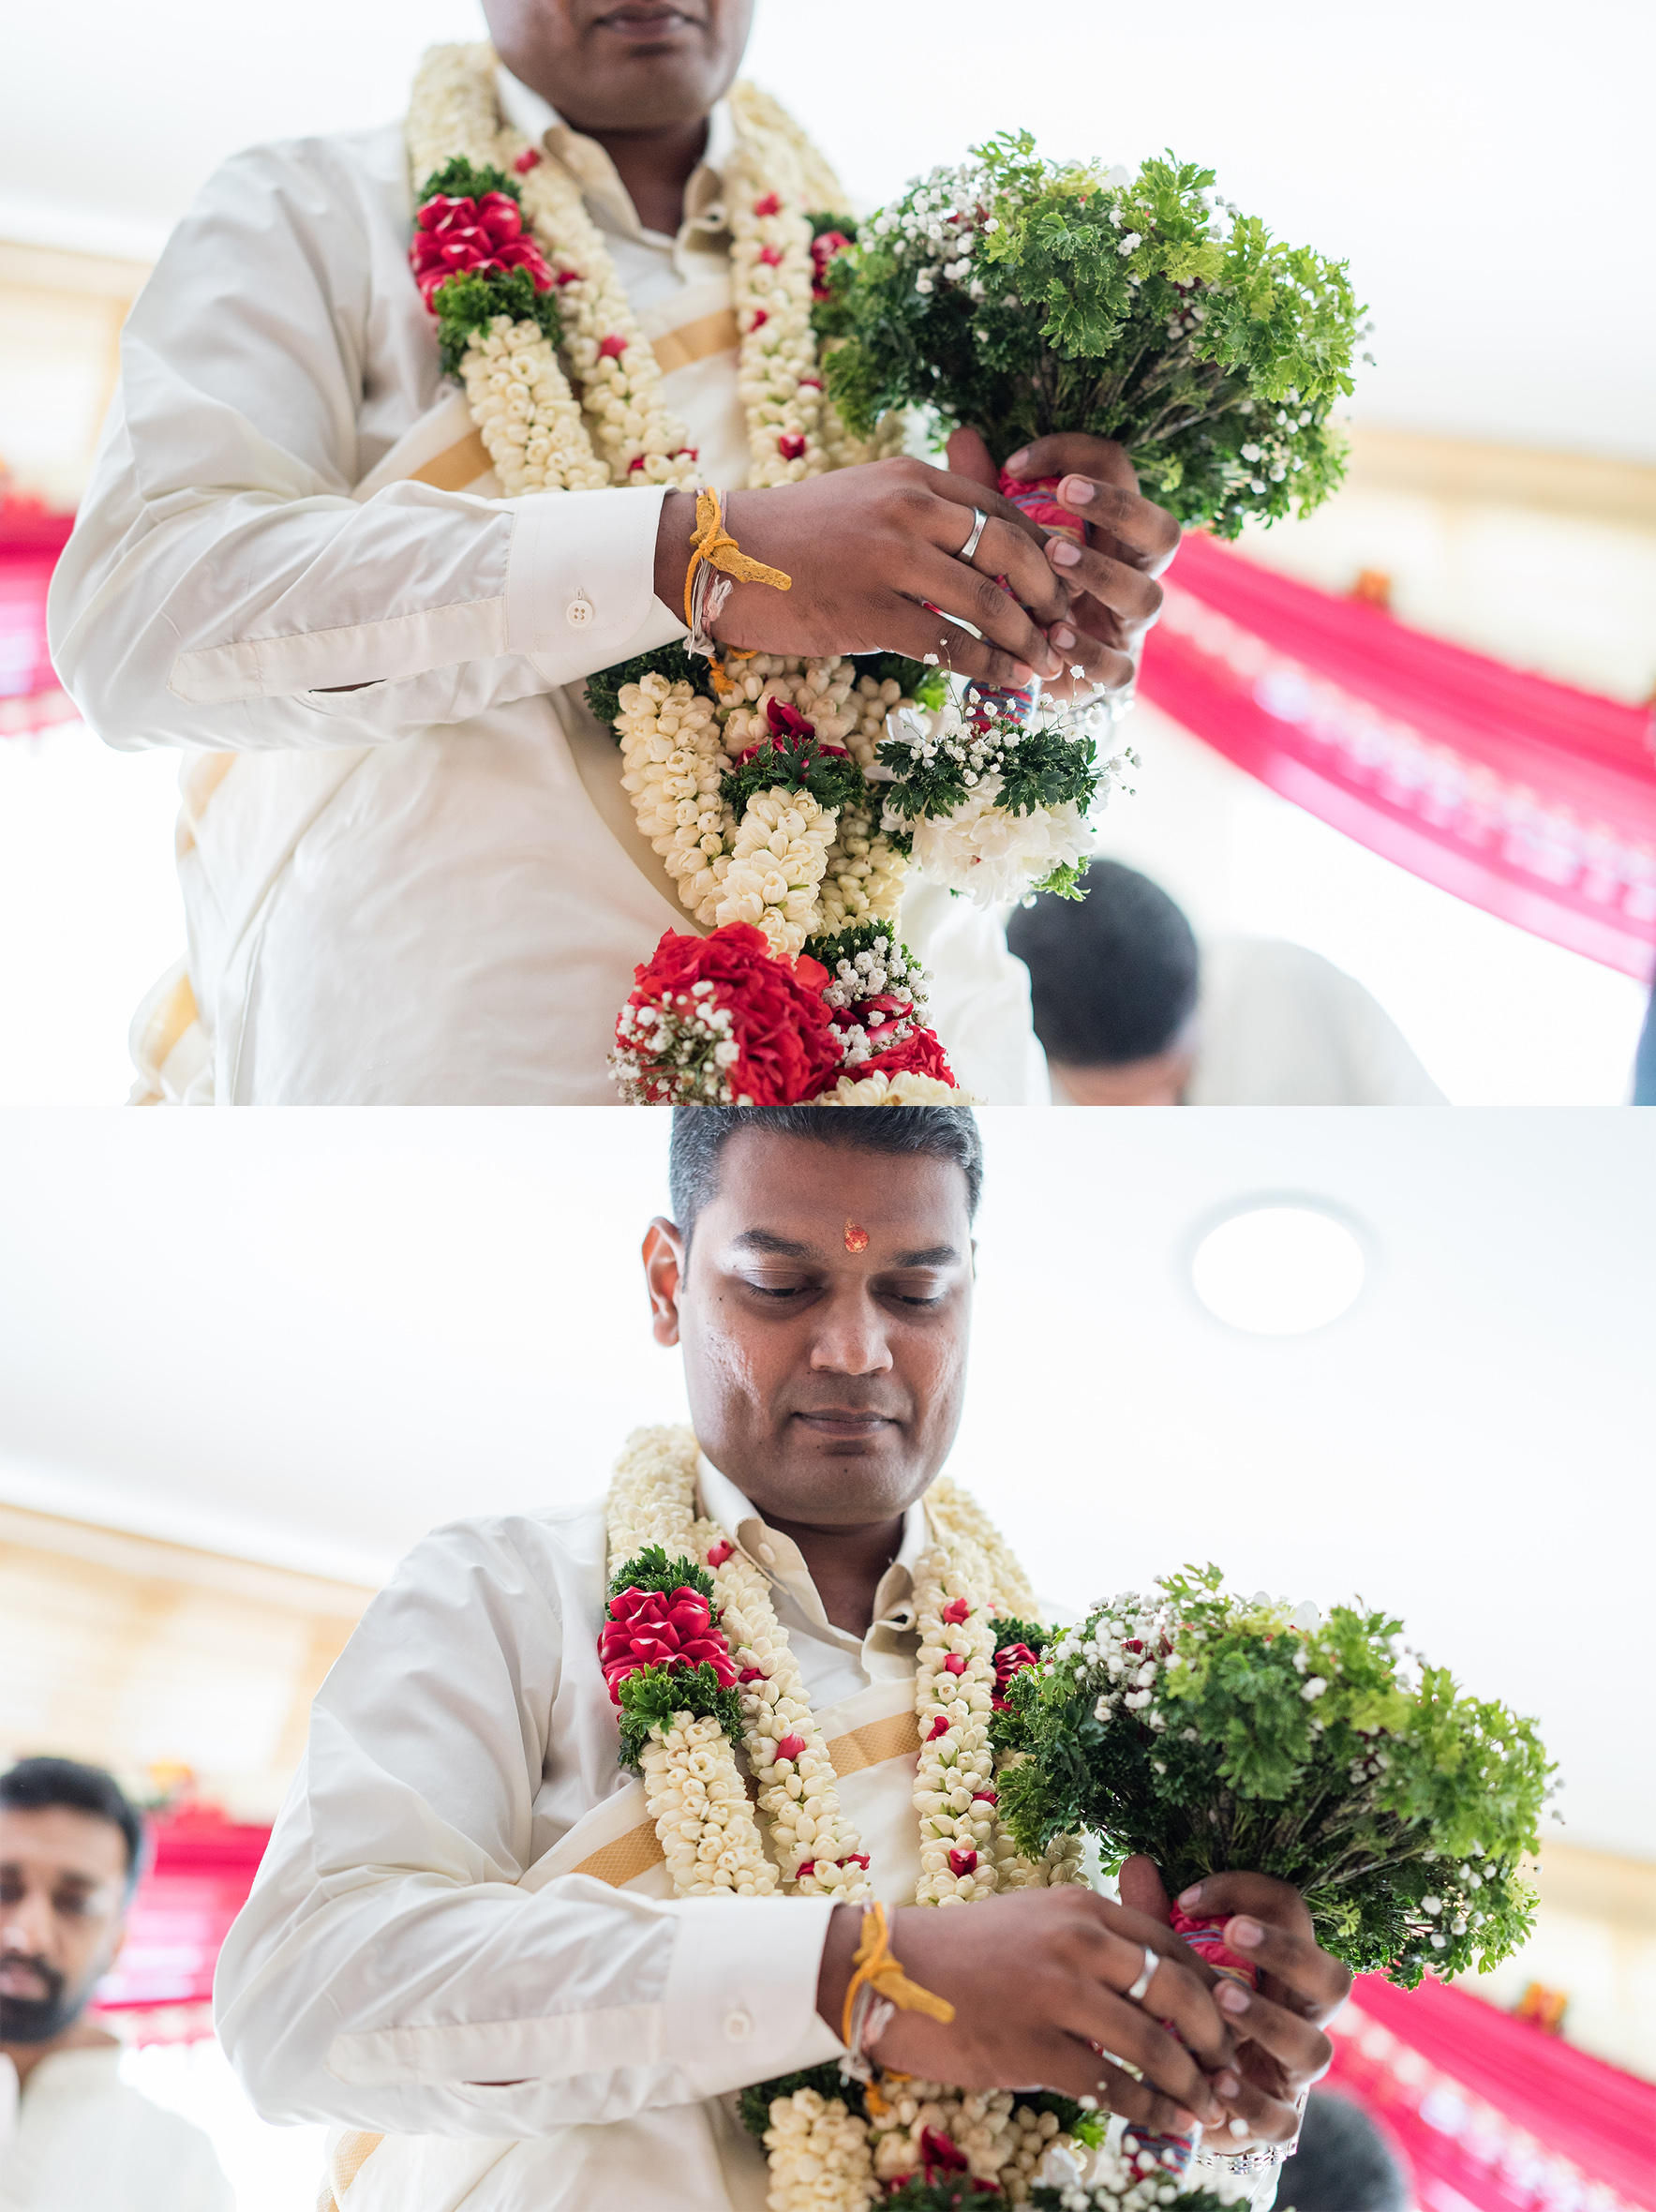 Grrom holding bouquet flower